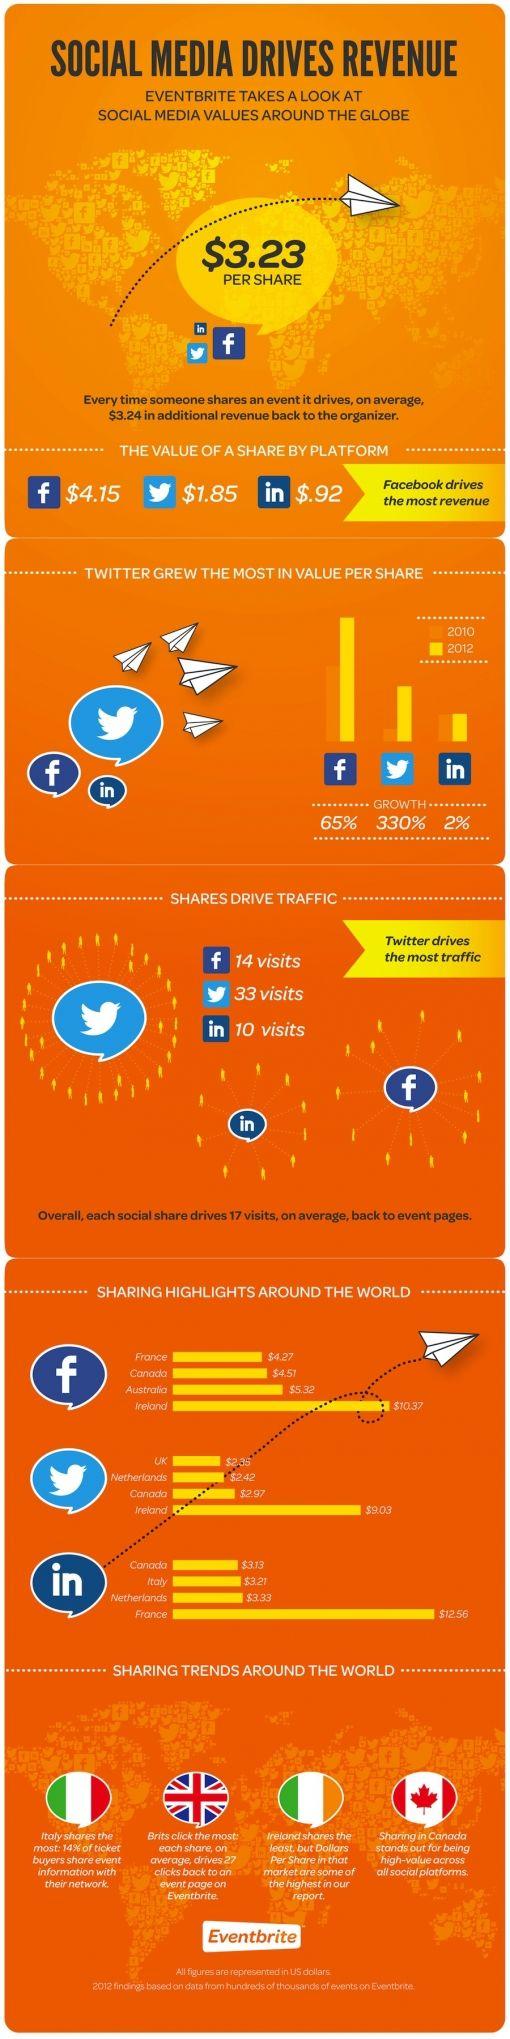 social-media-revenue